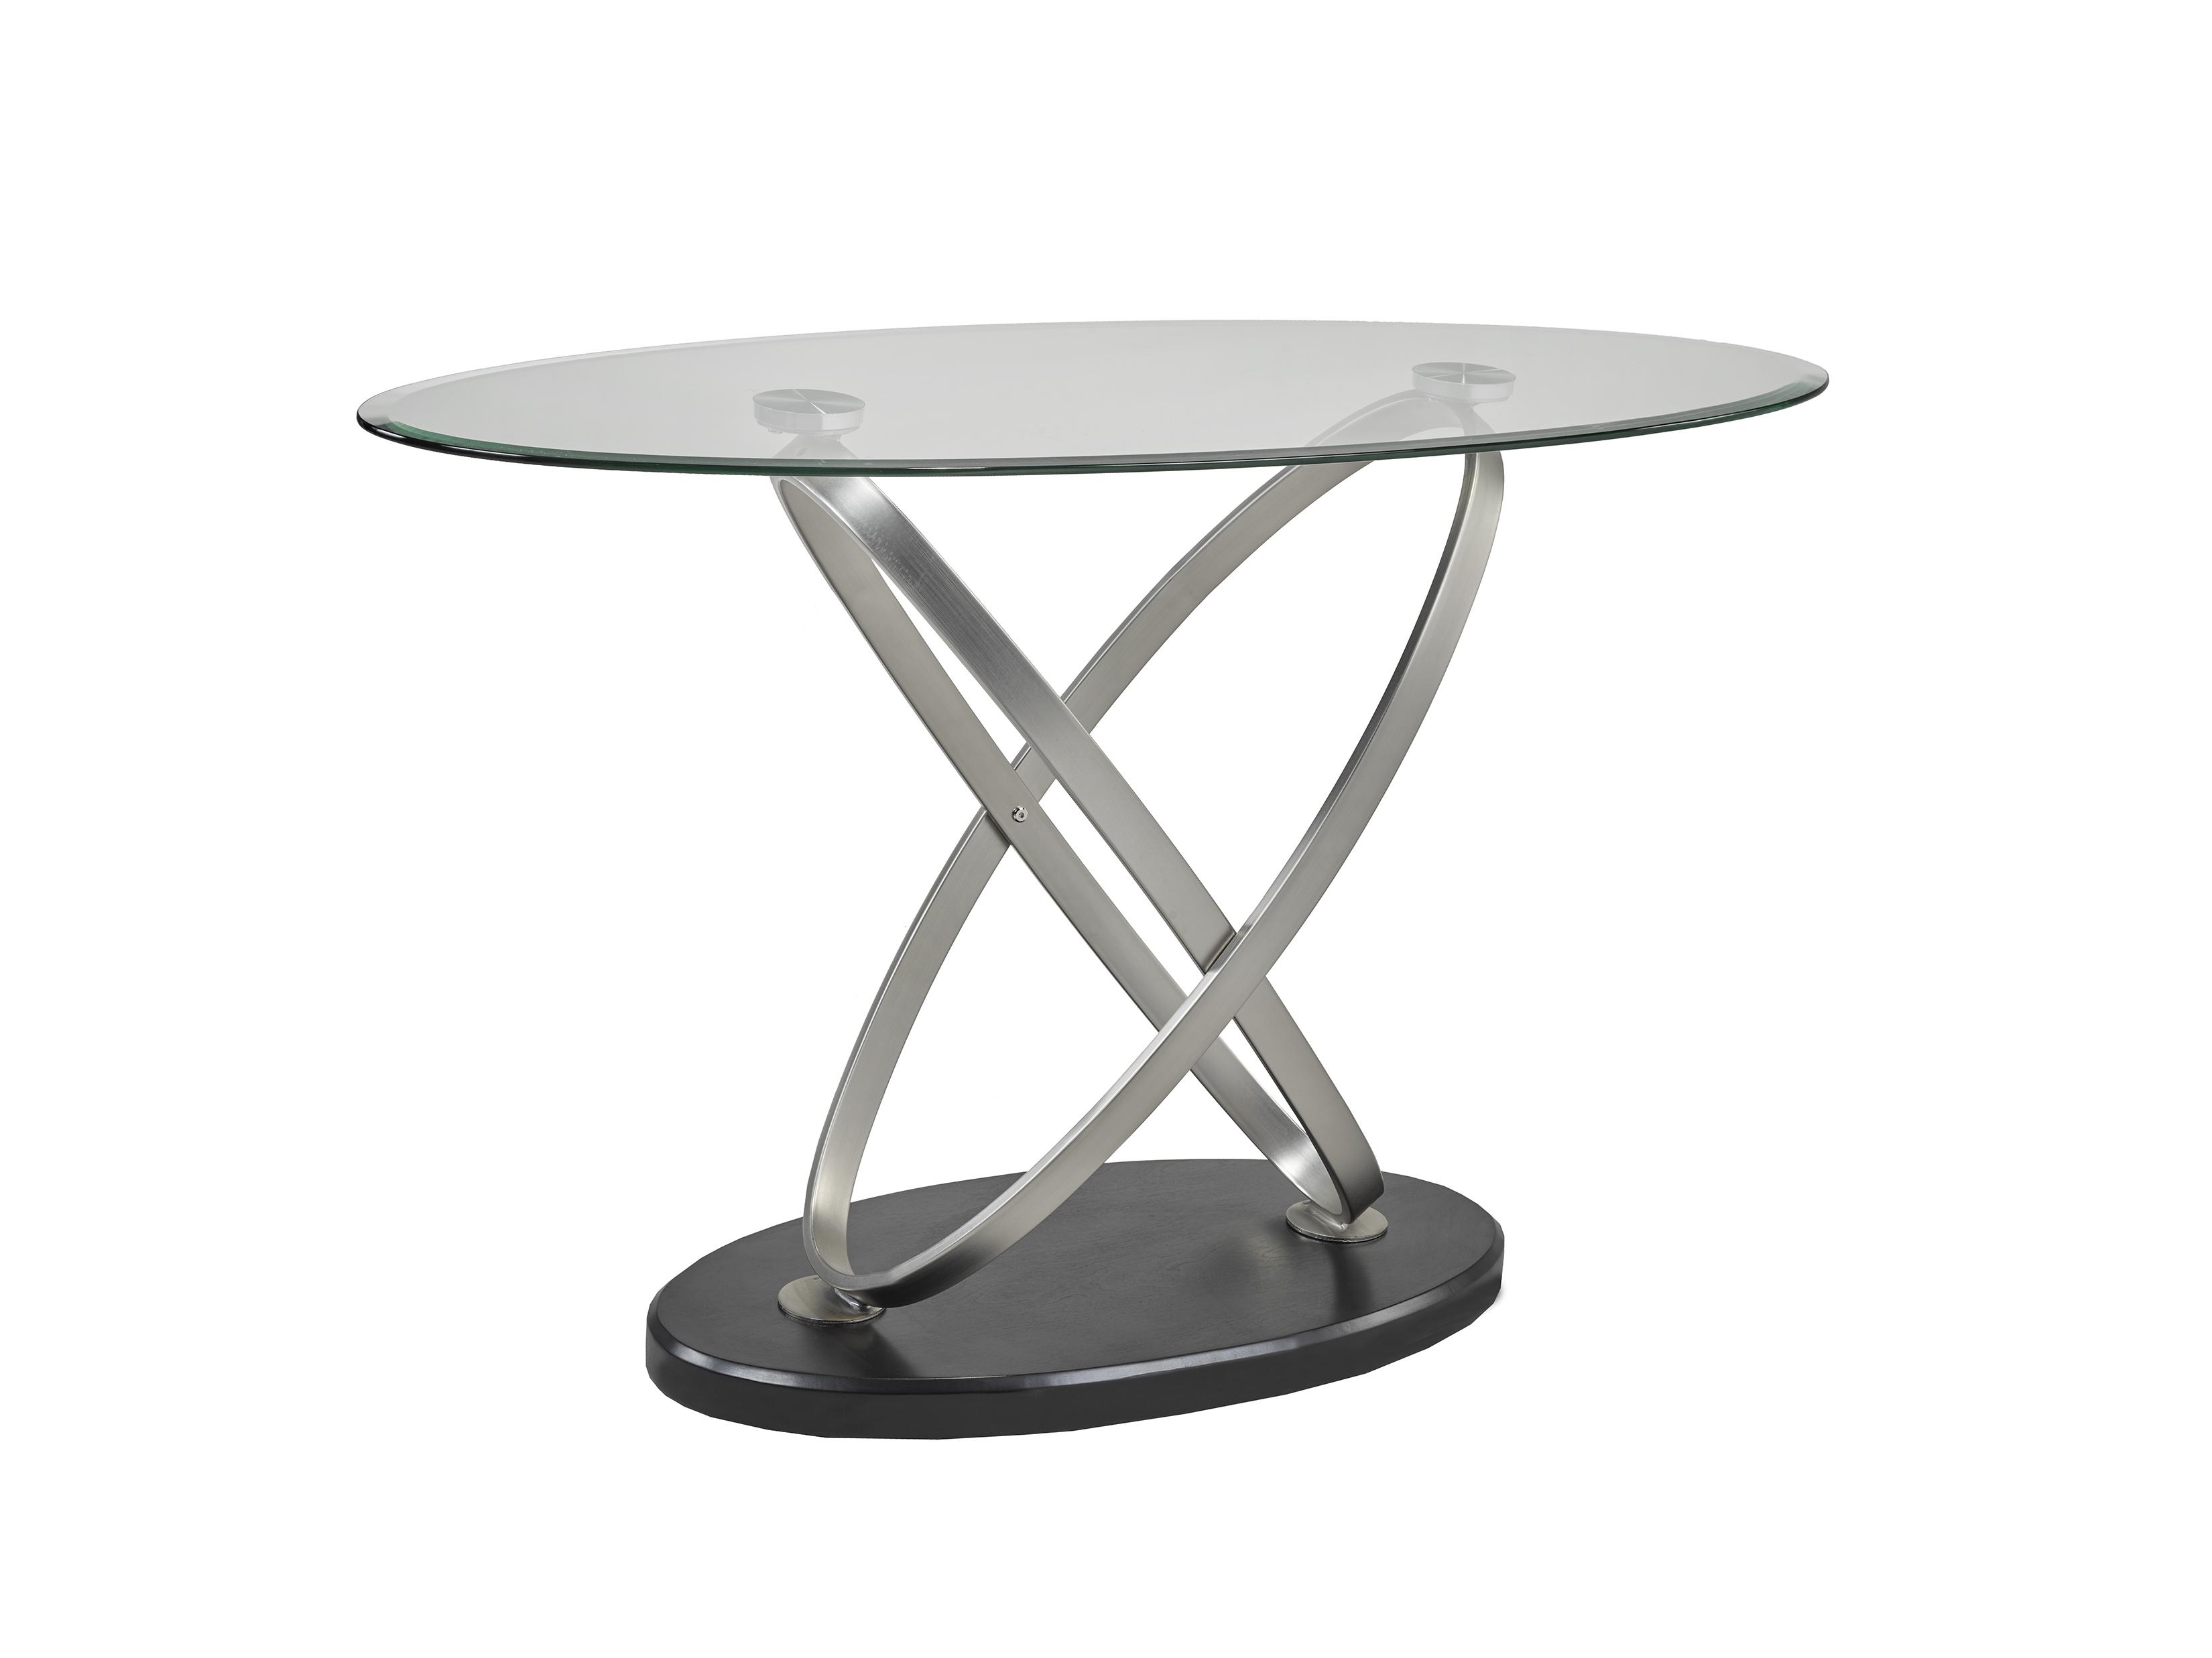 CHANTAL SOFA TABLE